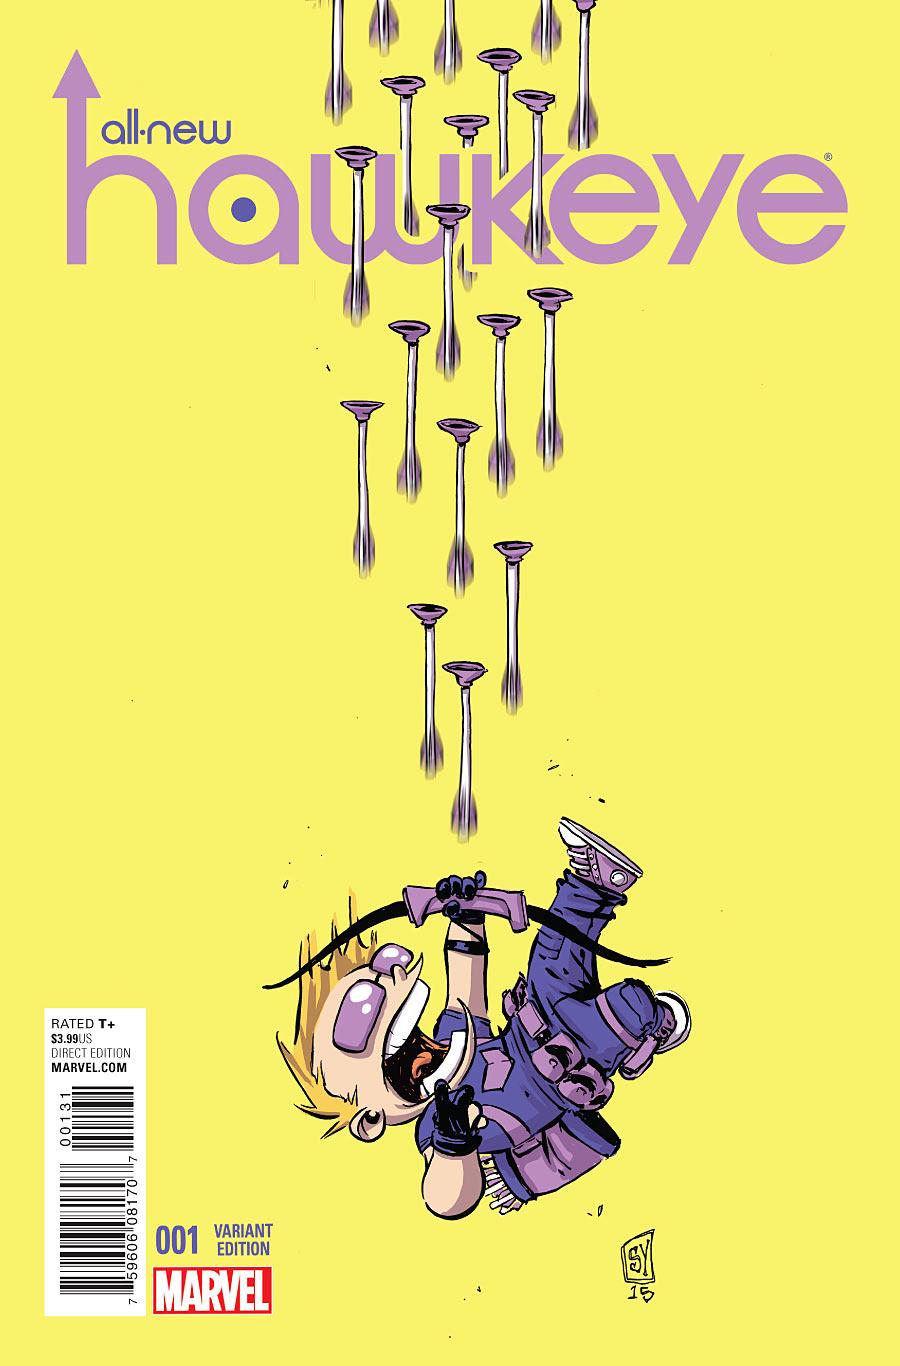 [Comics] Skottie Young, un dessineux que j'adore! - Page 2 307330anh11